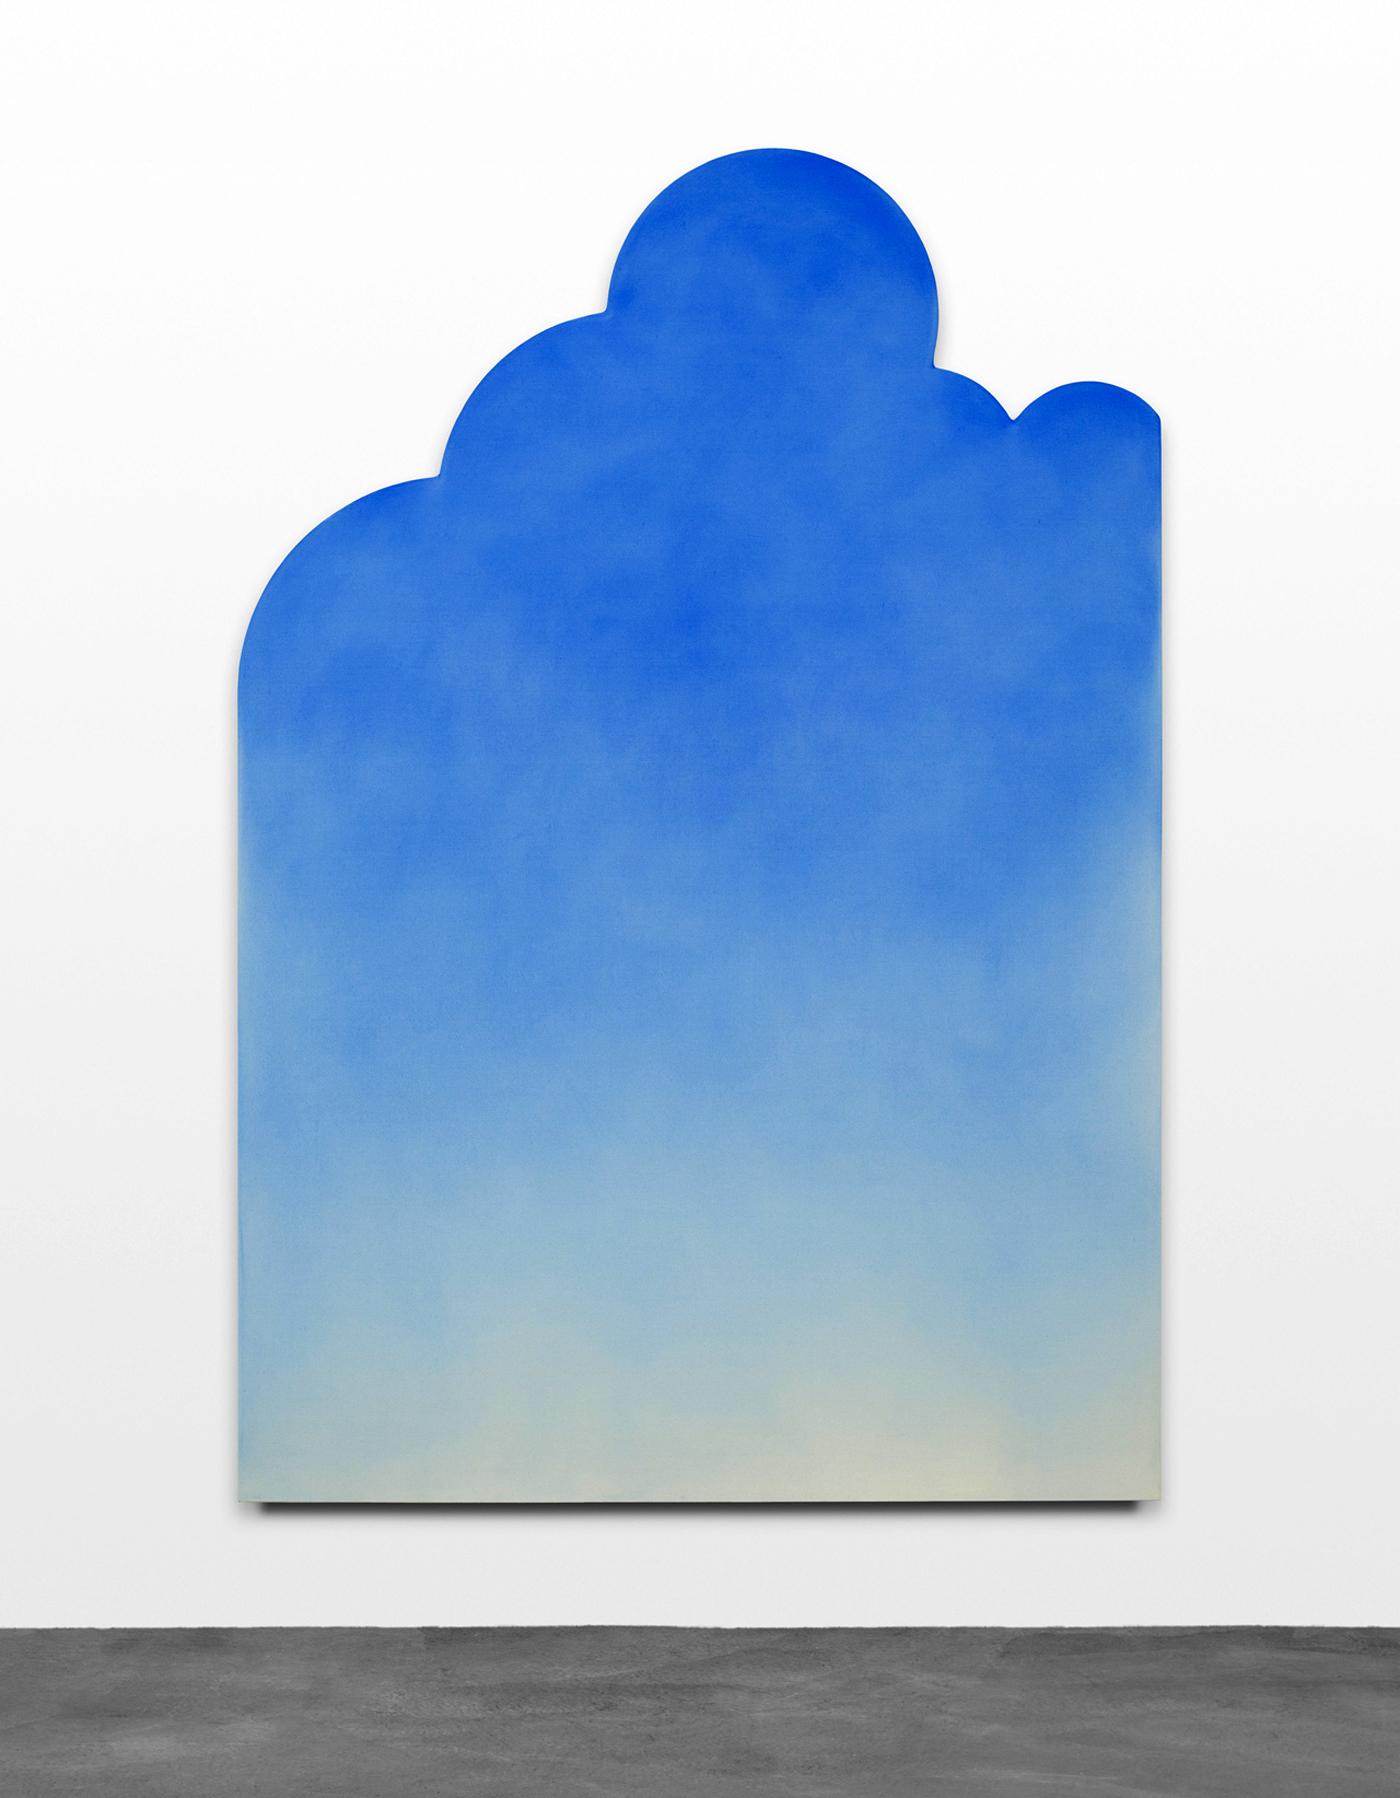 "Ugo Rondinone, ""fünfundzwanzigsterjunizweitausendundfünfzehn"" (2015), acrylic on canvas (courtesy Sadie Coles HQ, London; © Ugo Rondinone)"